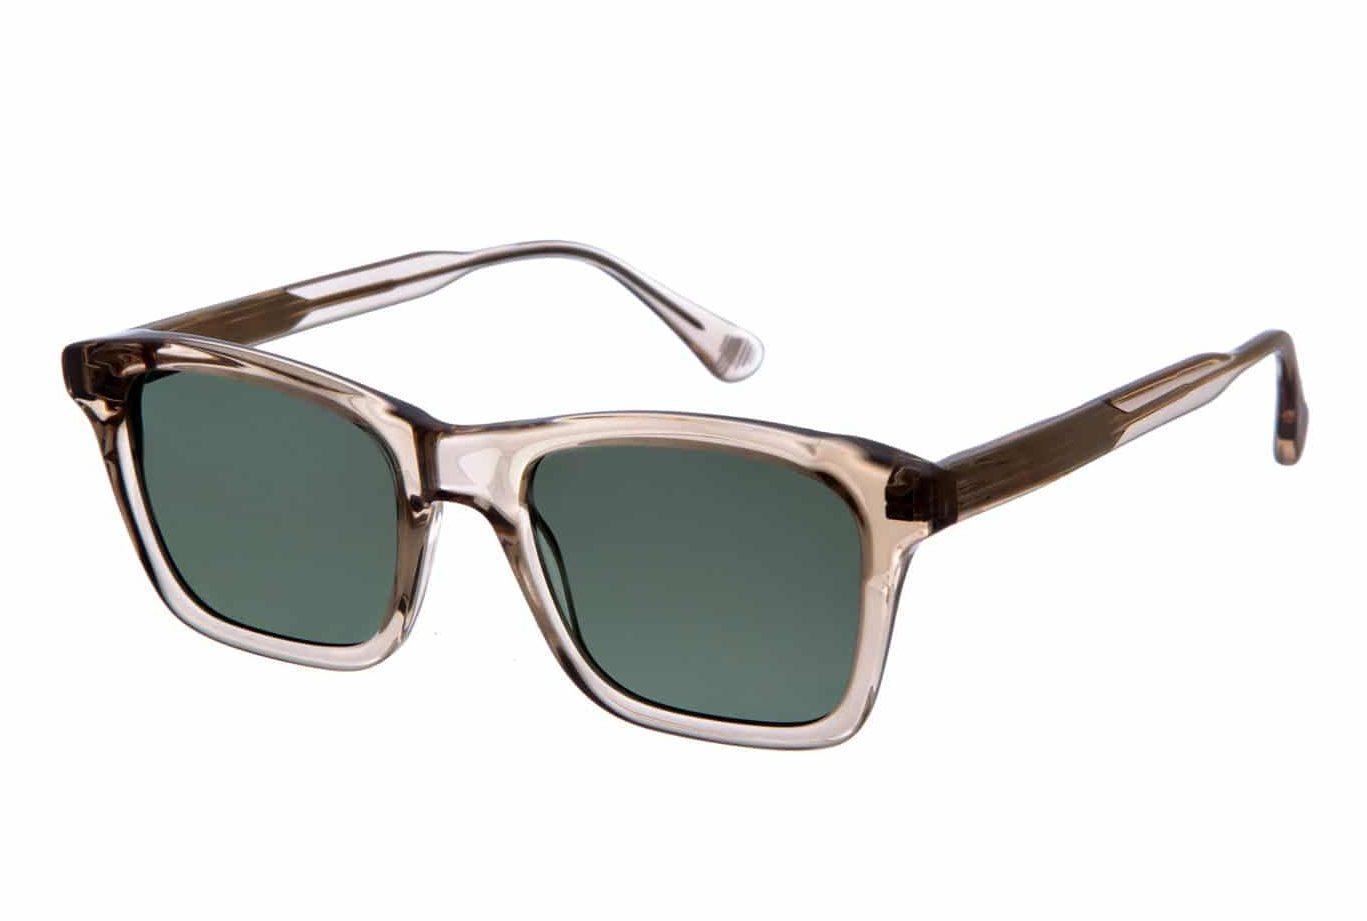 6533-2-kubrick-squared-crystal-sunglasses-by-gigi-barcelona-3-2048×1365